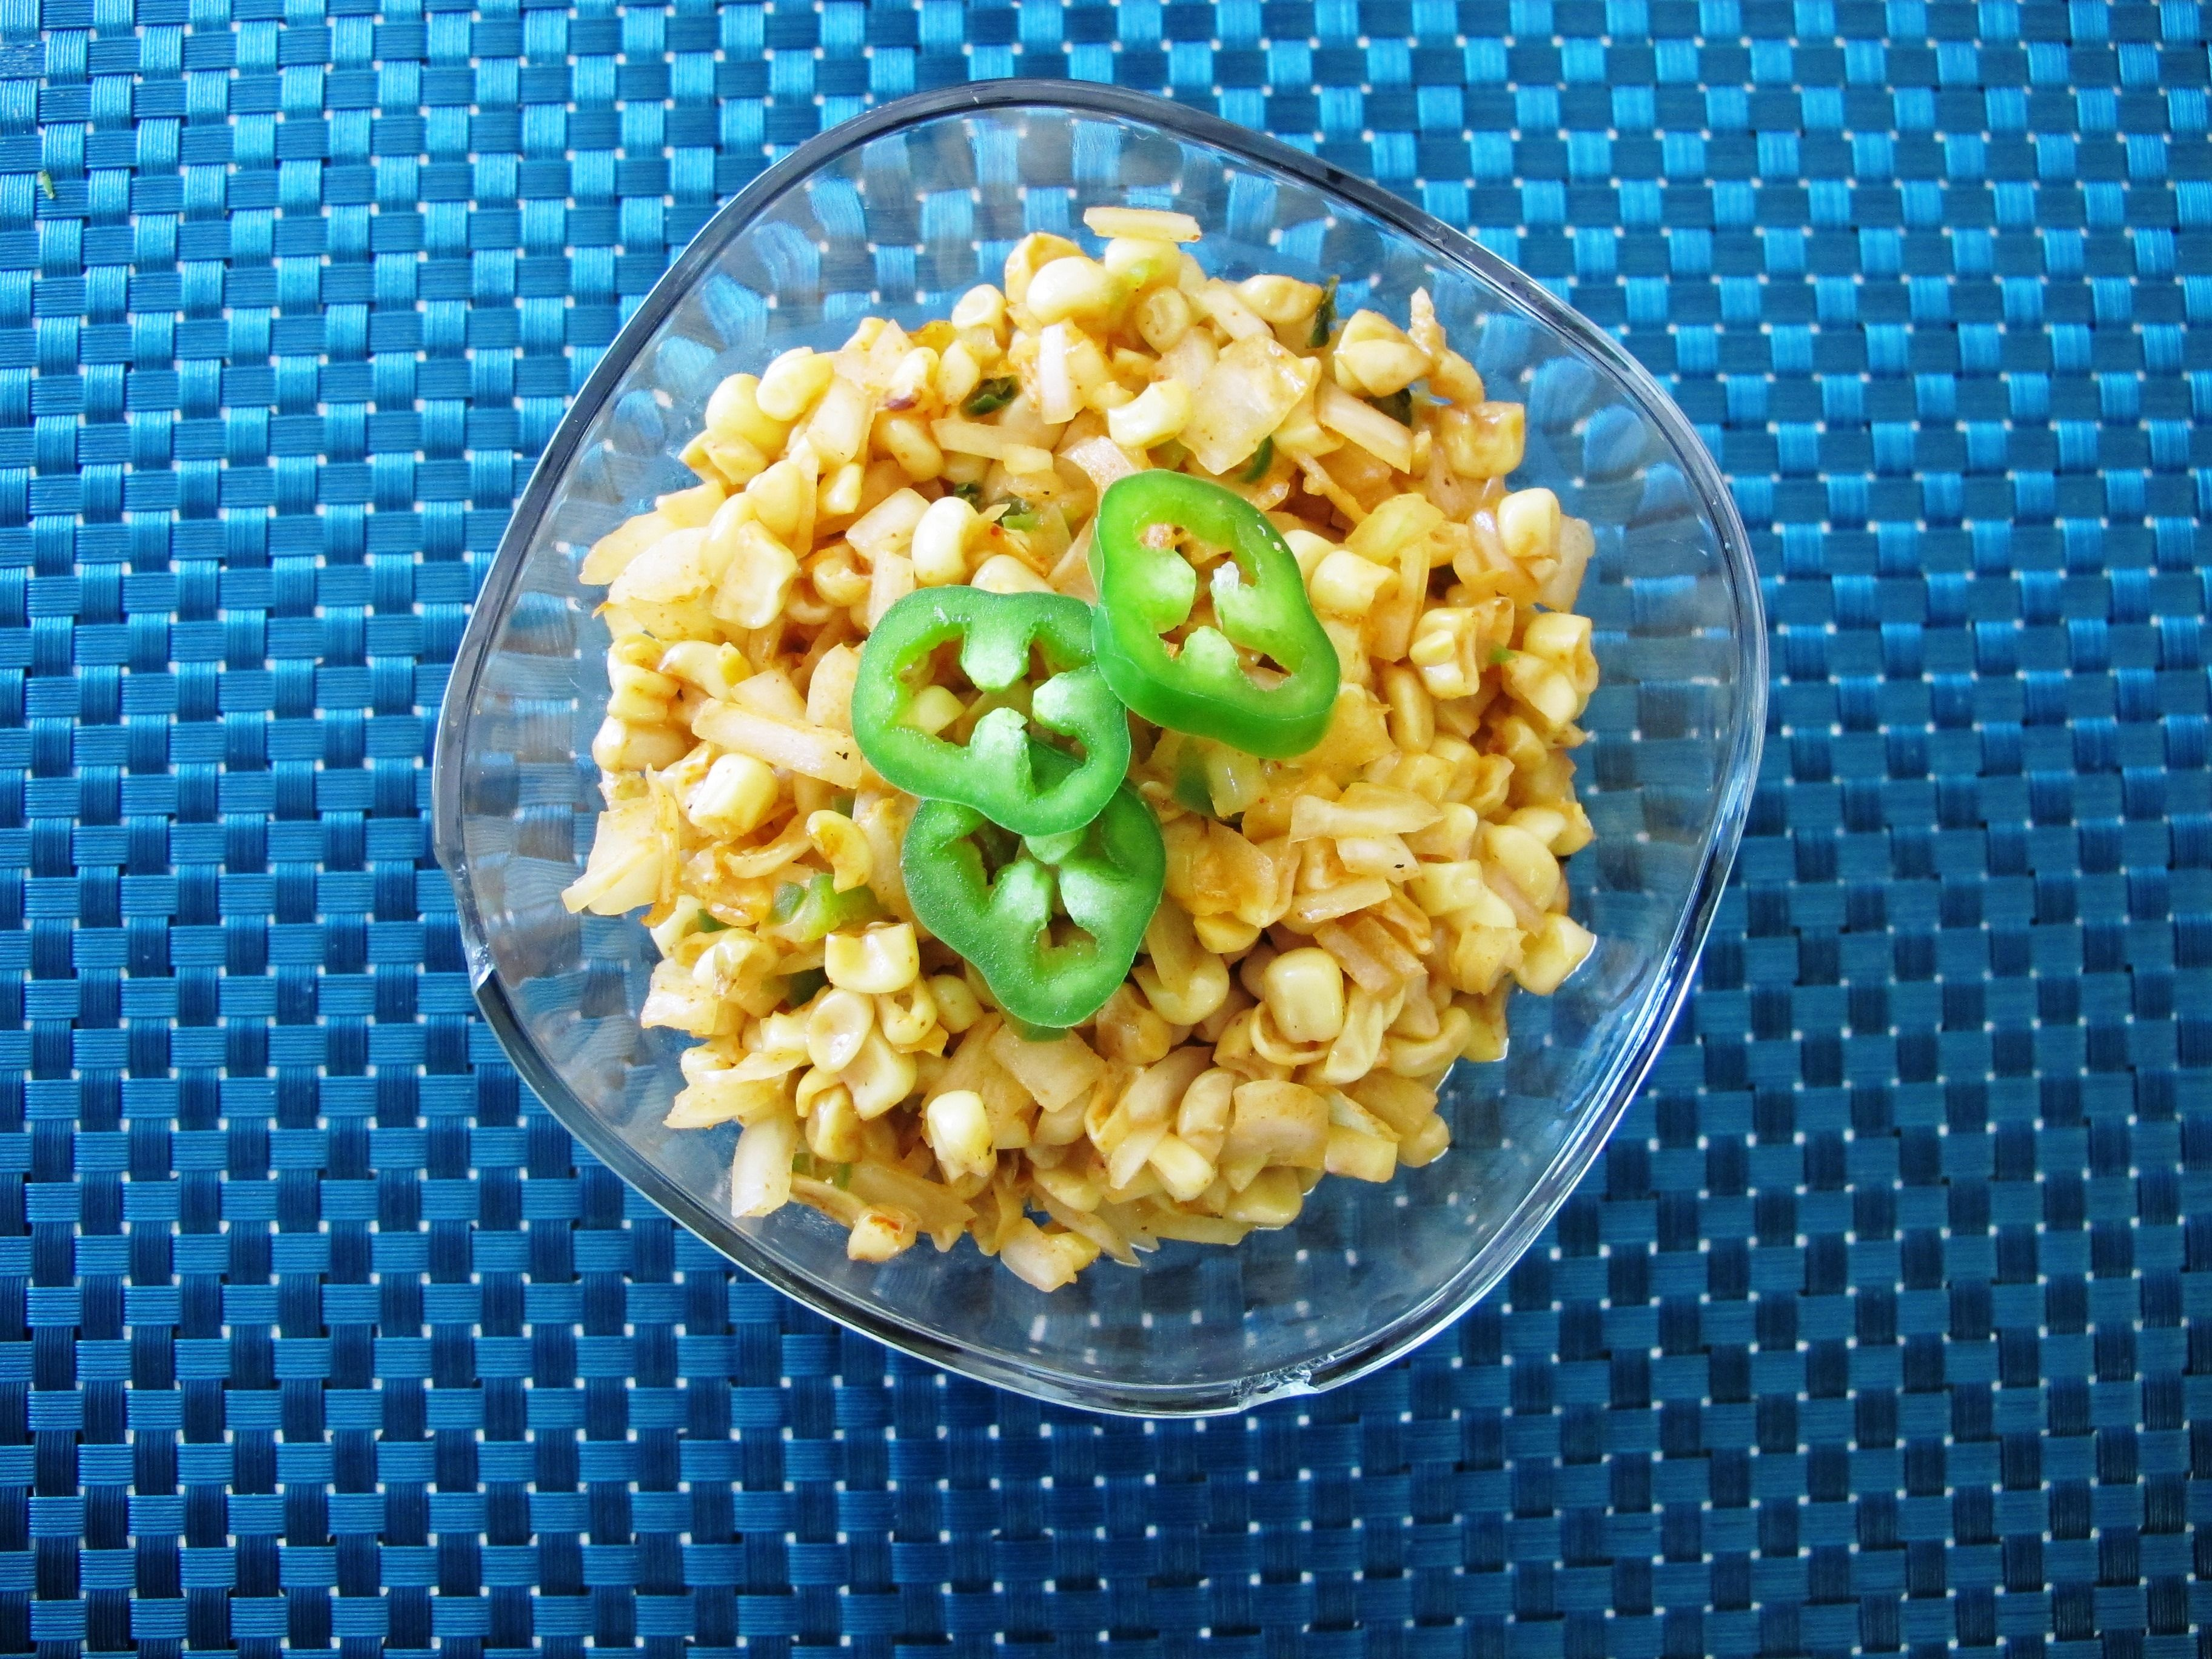 Jalapeno and Roasted Corn Salsa